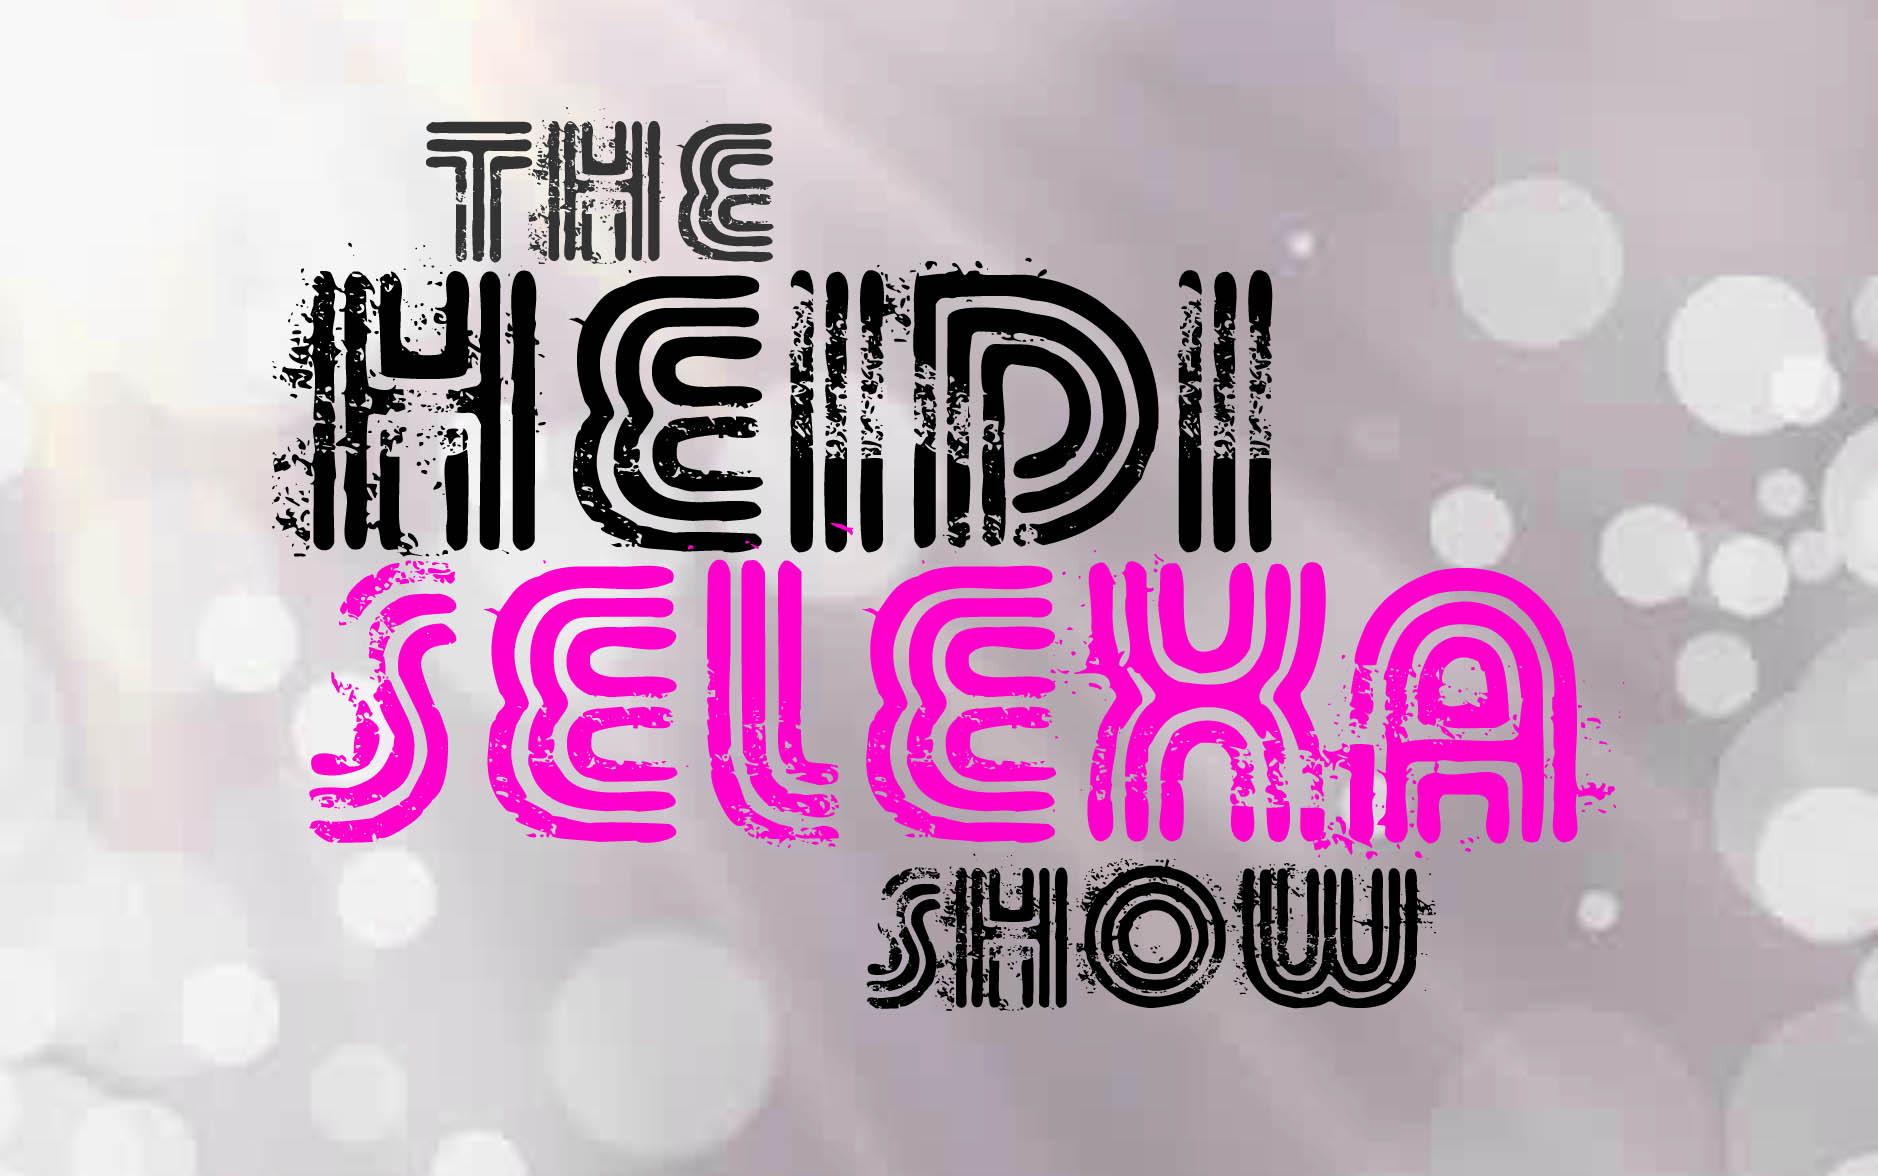 Heidi Selexa Show - Guest Dr. Brian Raskin